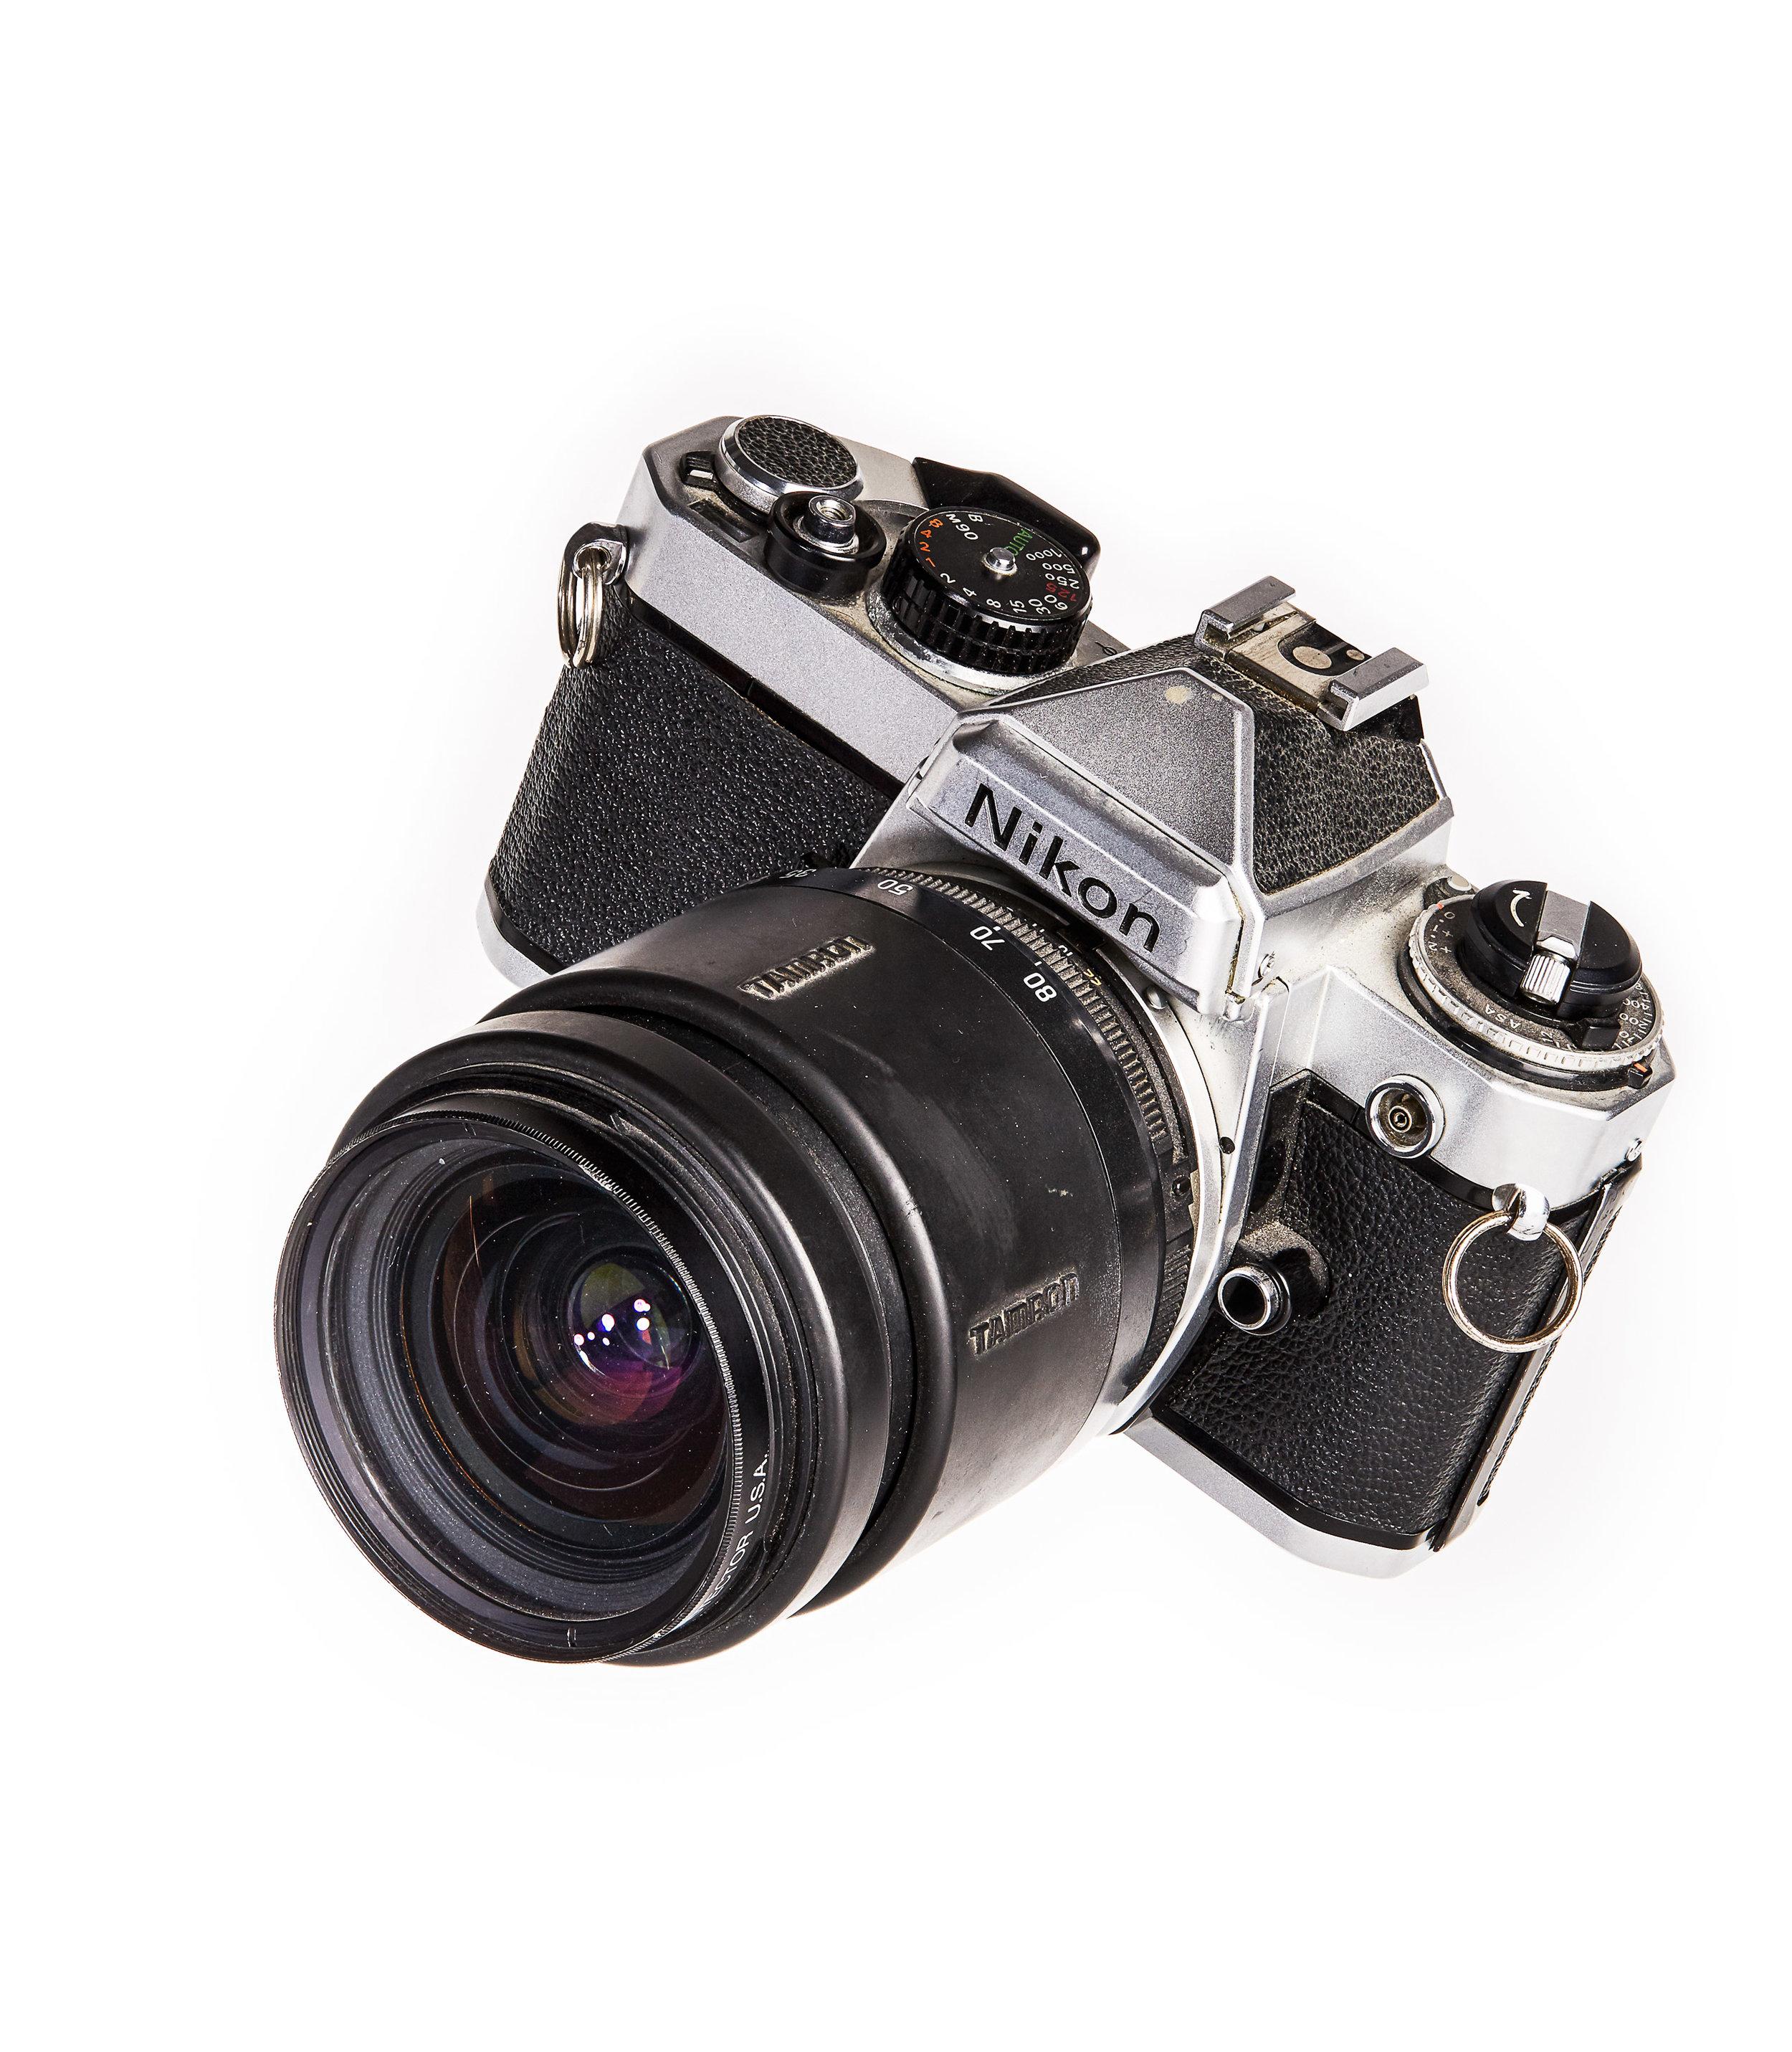 Jimmy Chin's First Camera